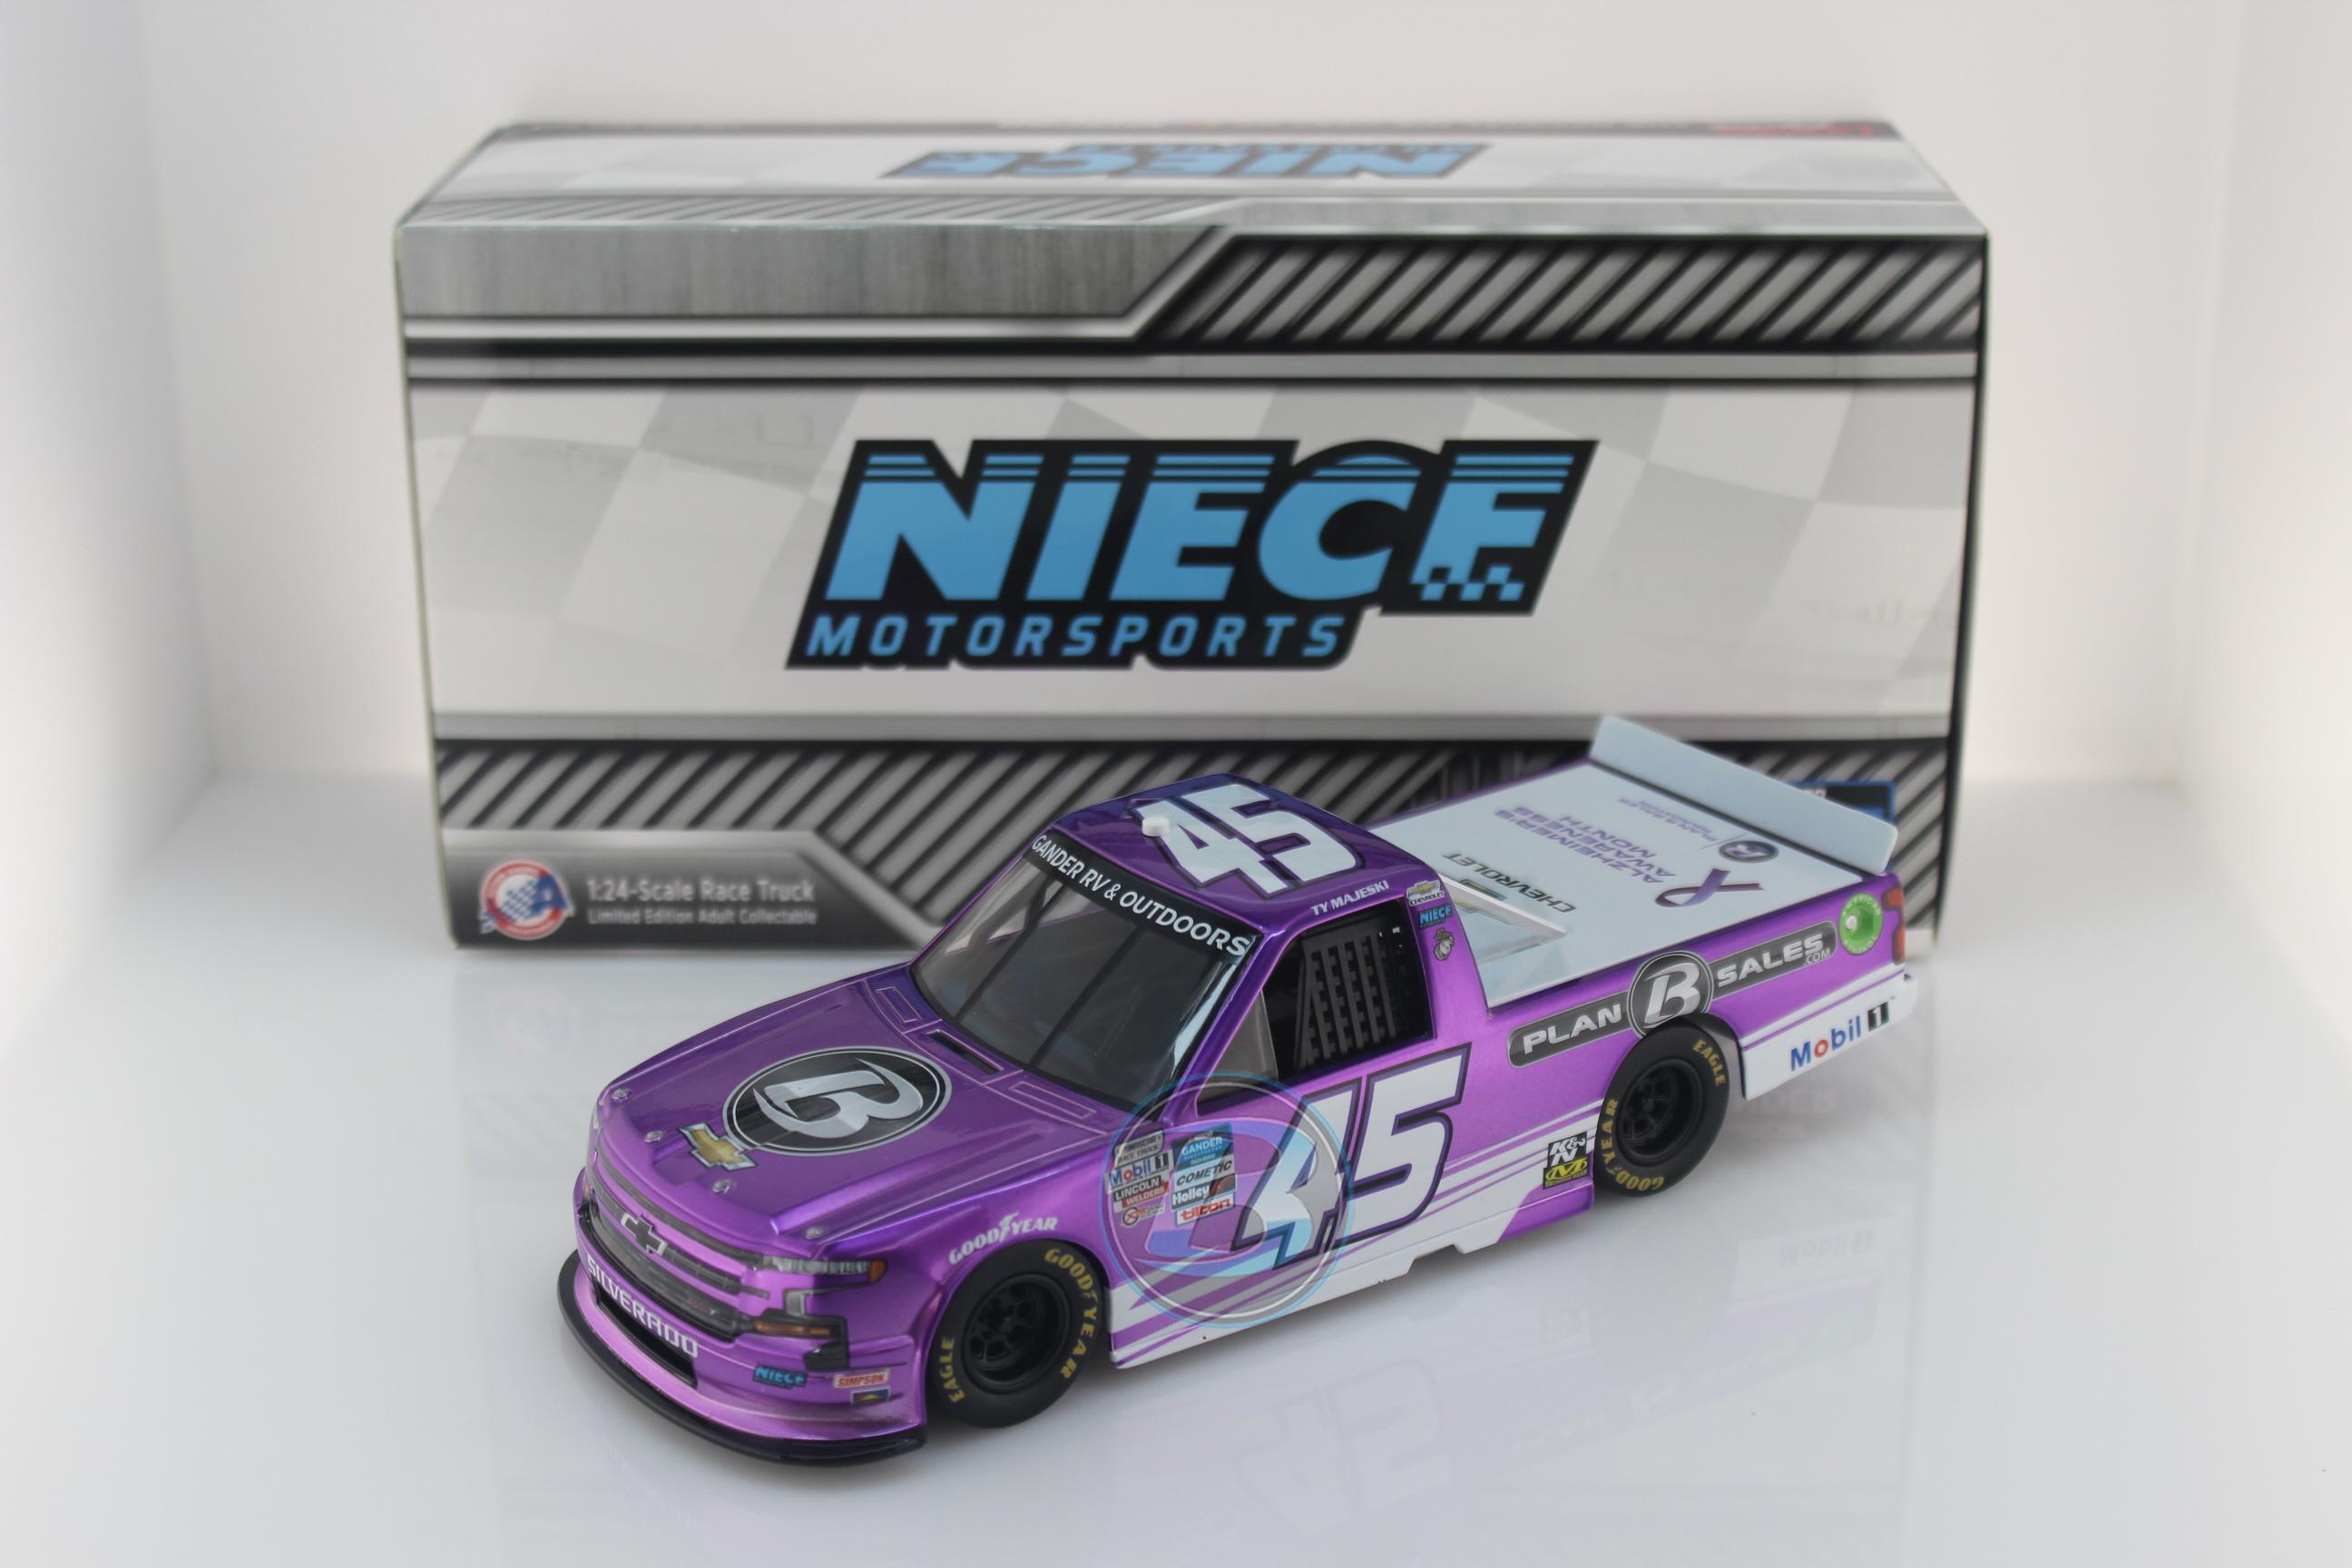 Lionel Racing Ty Majeski 2020 Plan B Sales//Alzheimers Awareness Month 1:64 Nascar Diecast